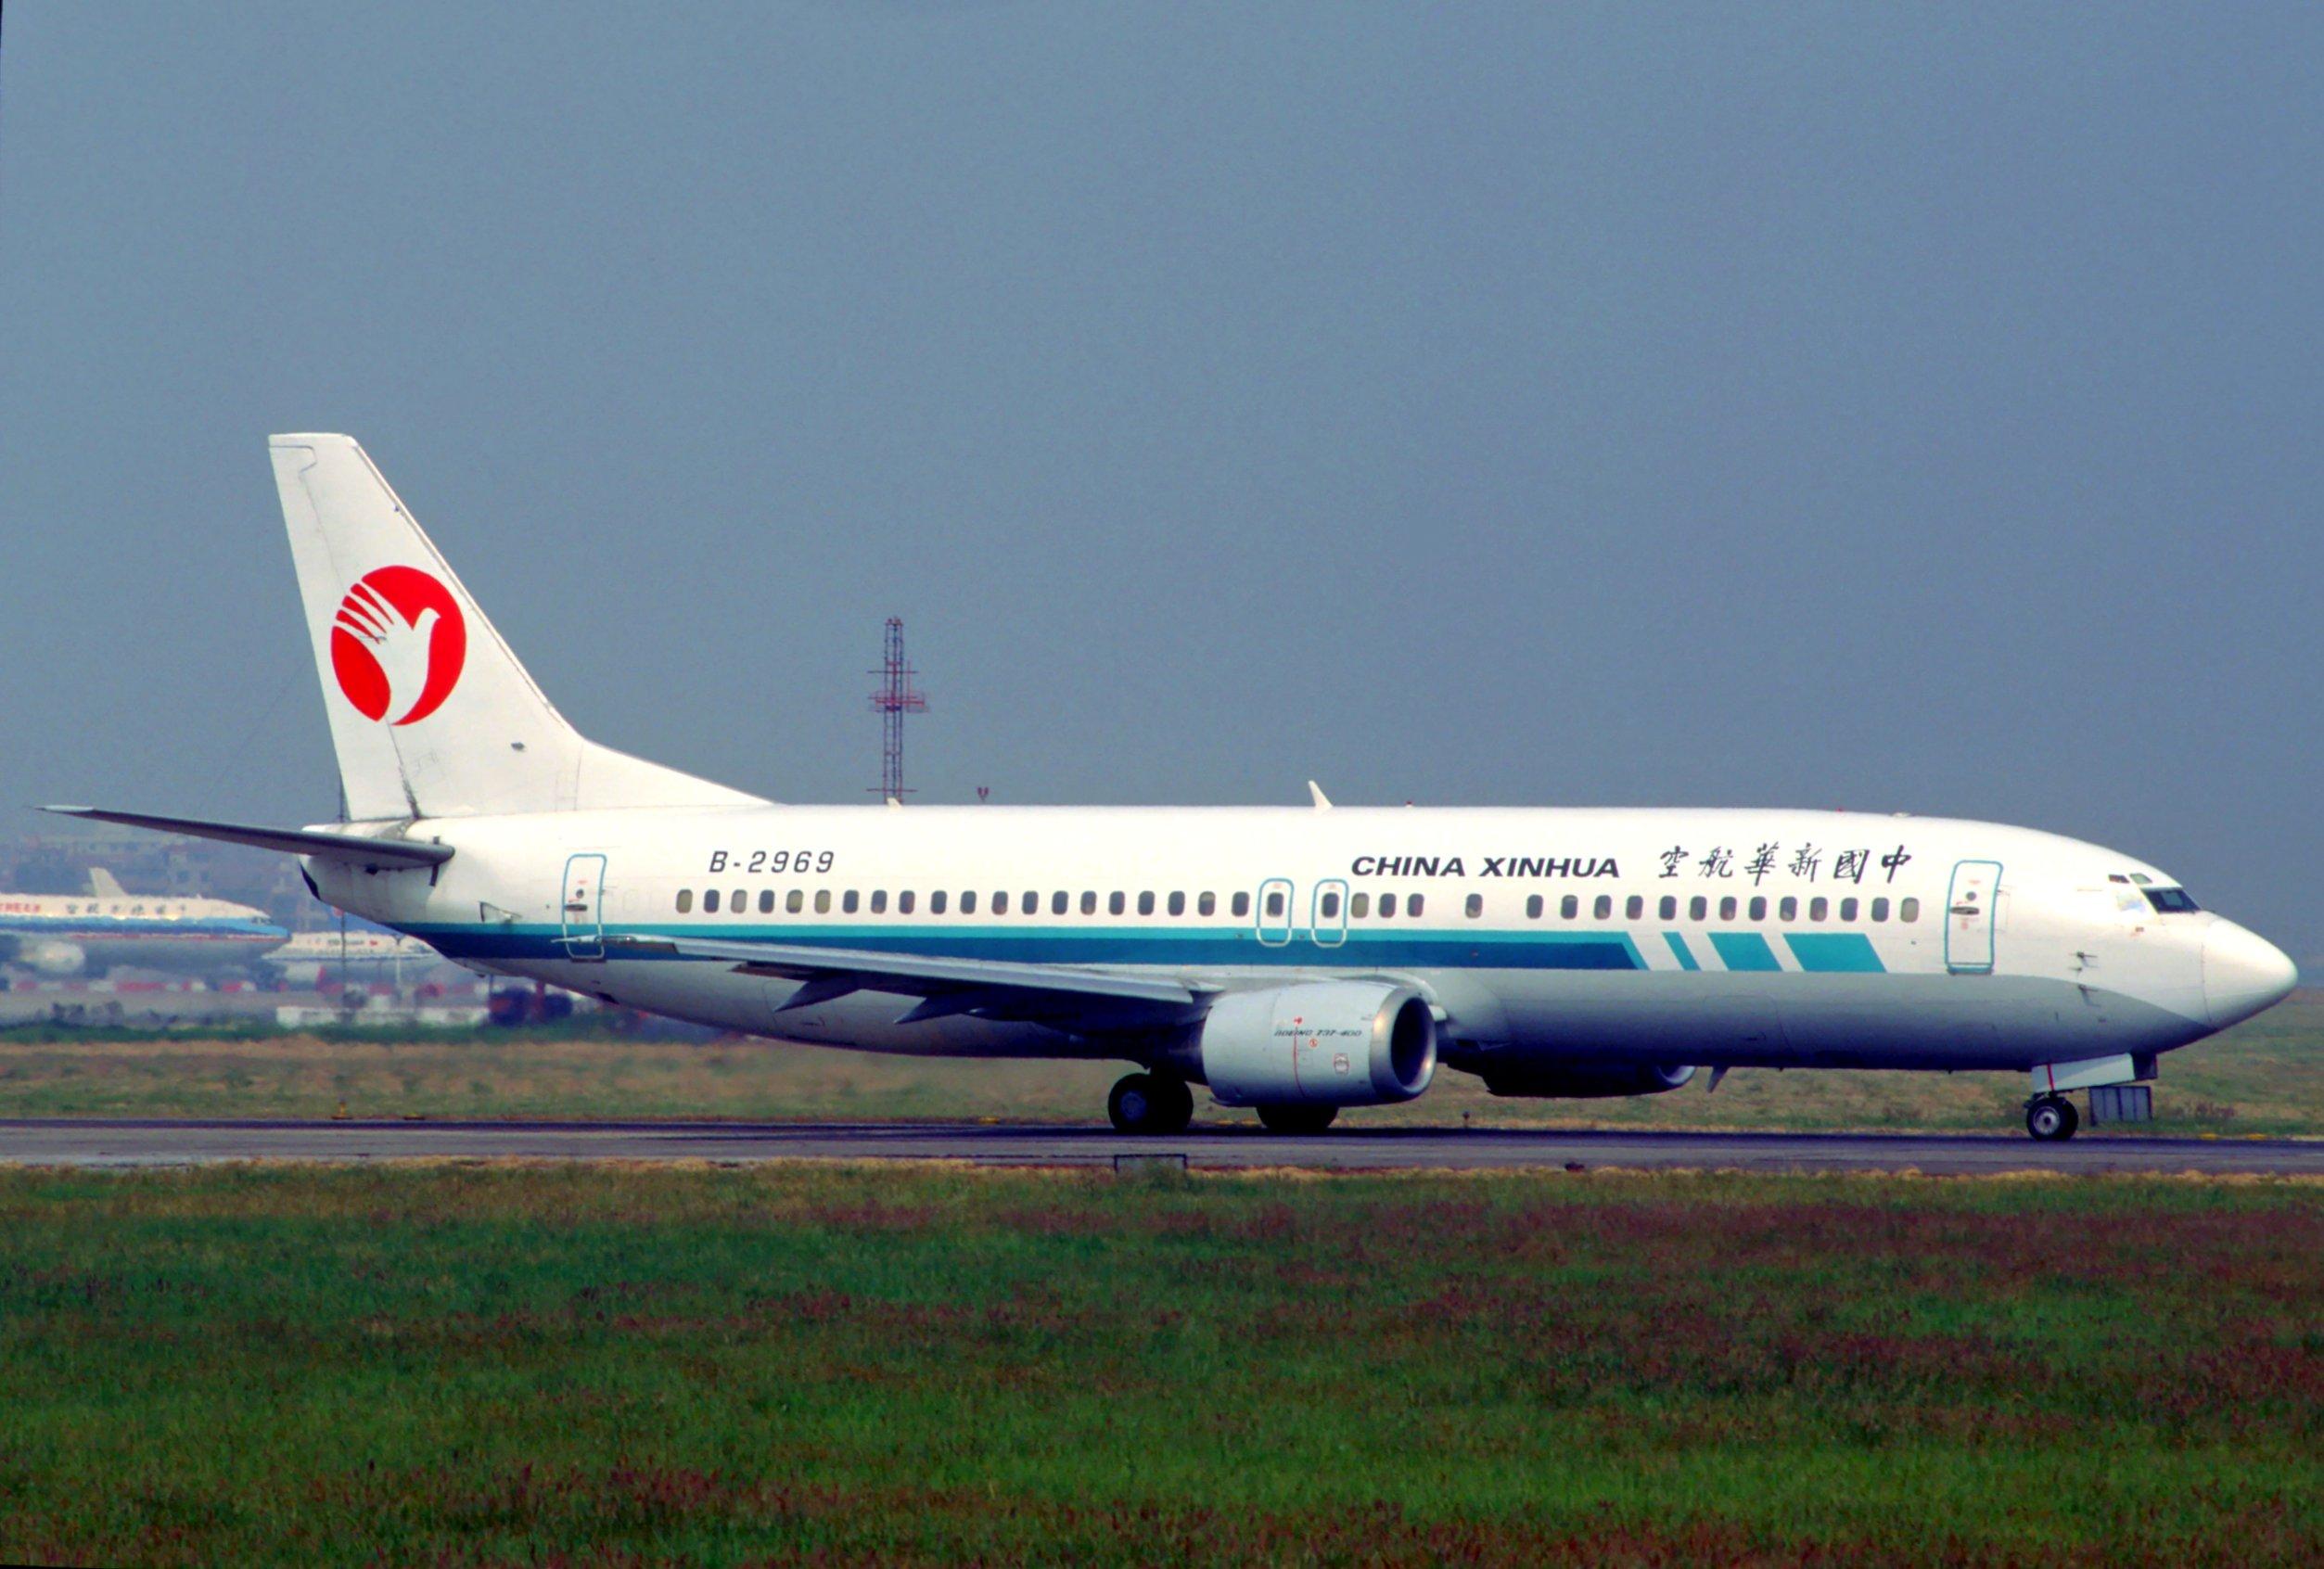 Xinhua China  city photo : Description China Xinhua Airlines Boeing 737 400; B 2969, October 1996 ...